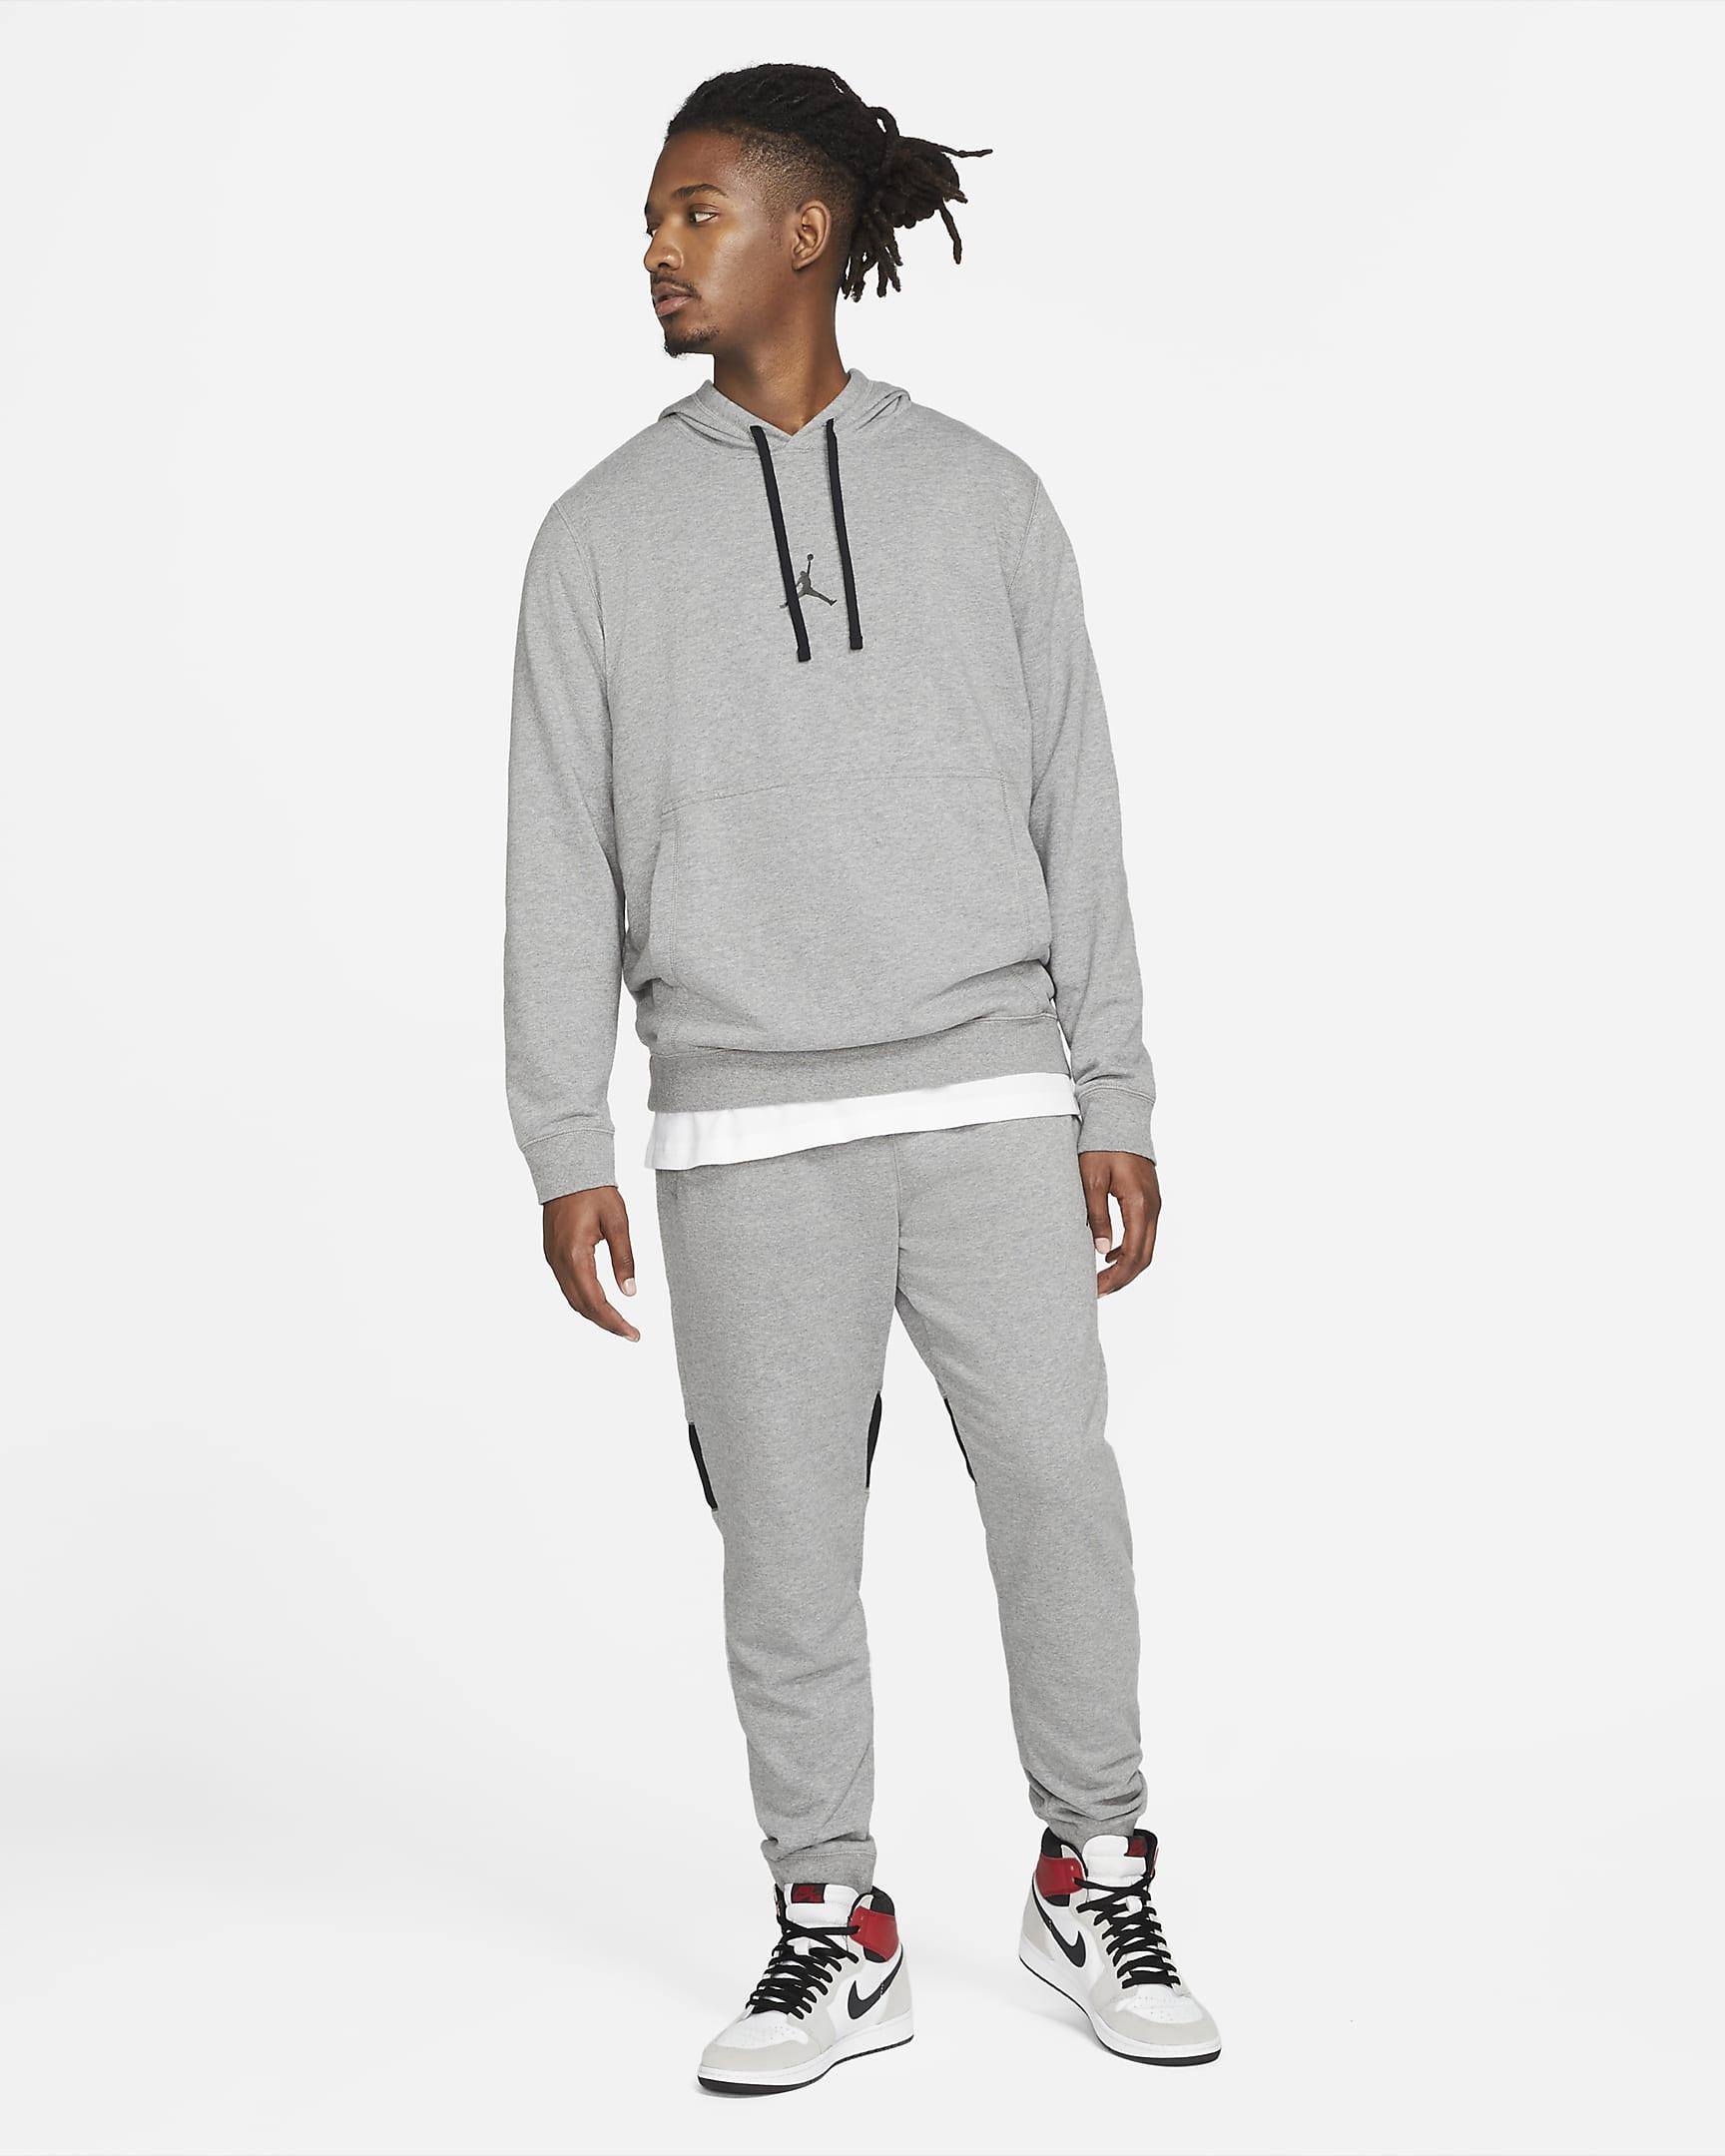 jordan-dri-fit-air-mens-fleece-pullover-hoodie-wT5ZhX-3.png